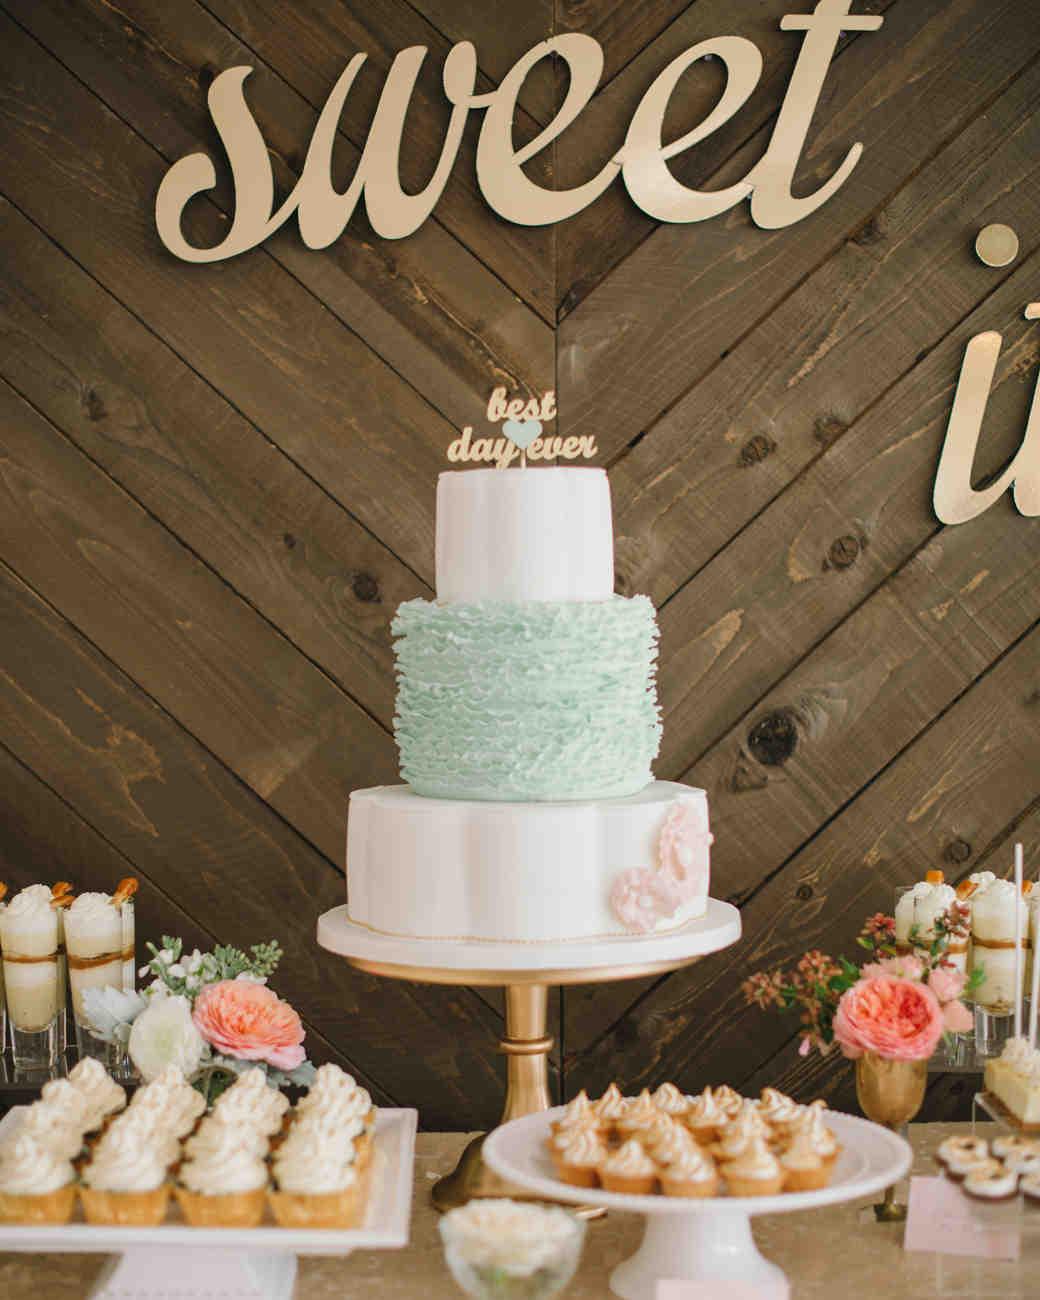 alex-brandon-wedding-cake-041-s111338-0714.jpg